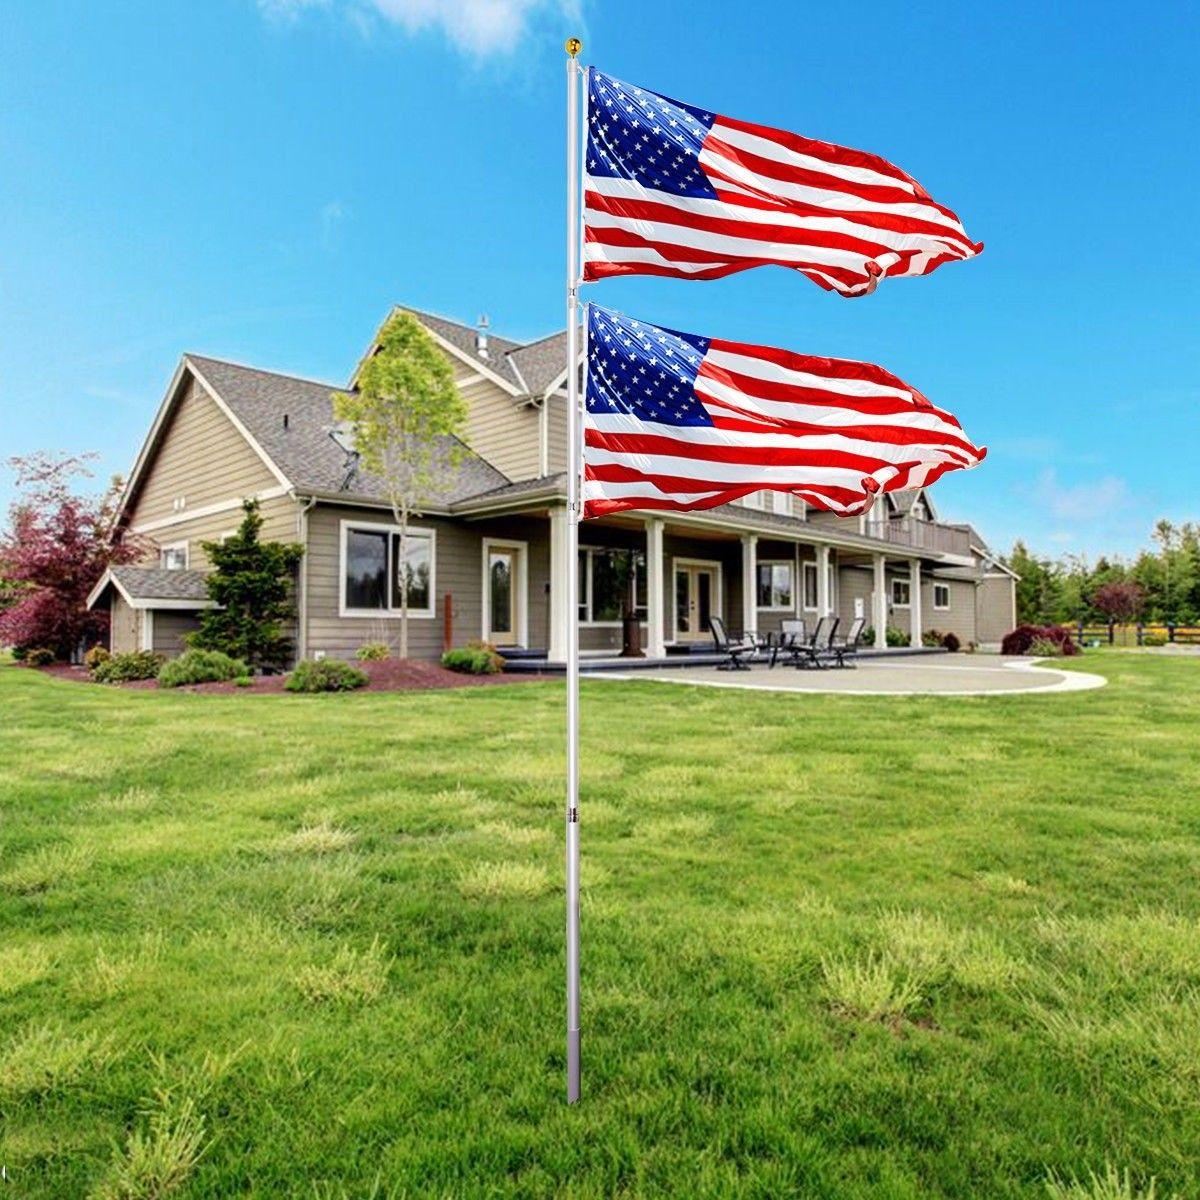 25ft Telescoping Flagpole 2 Us America Flag Kit Telescoping Flagpole Outdoor Flags Flag Pole